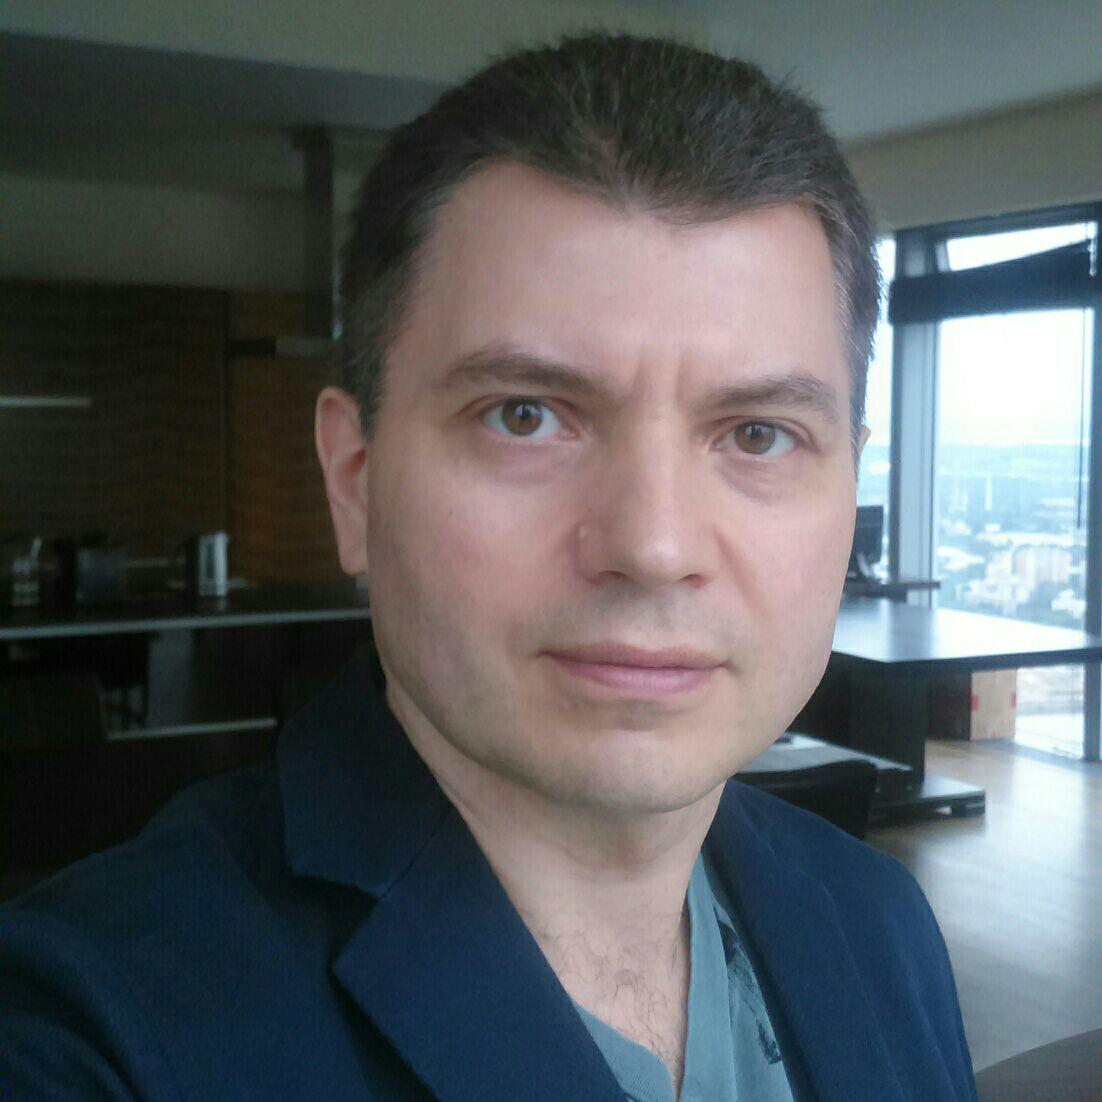 IgorSmirnov